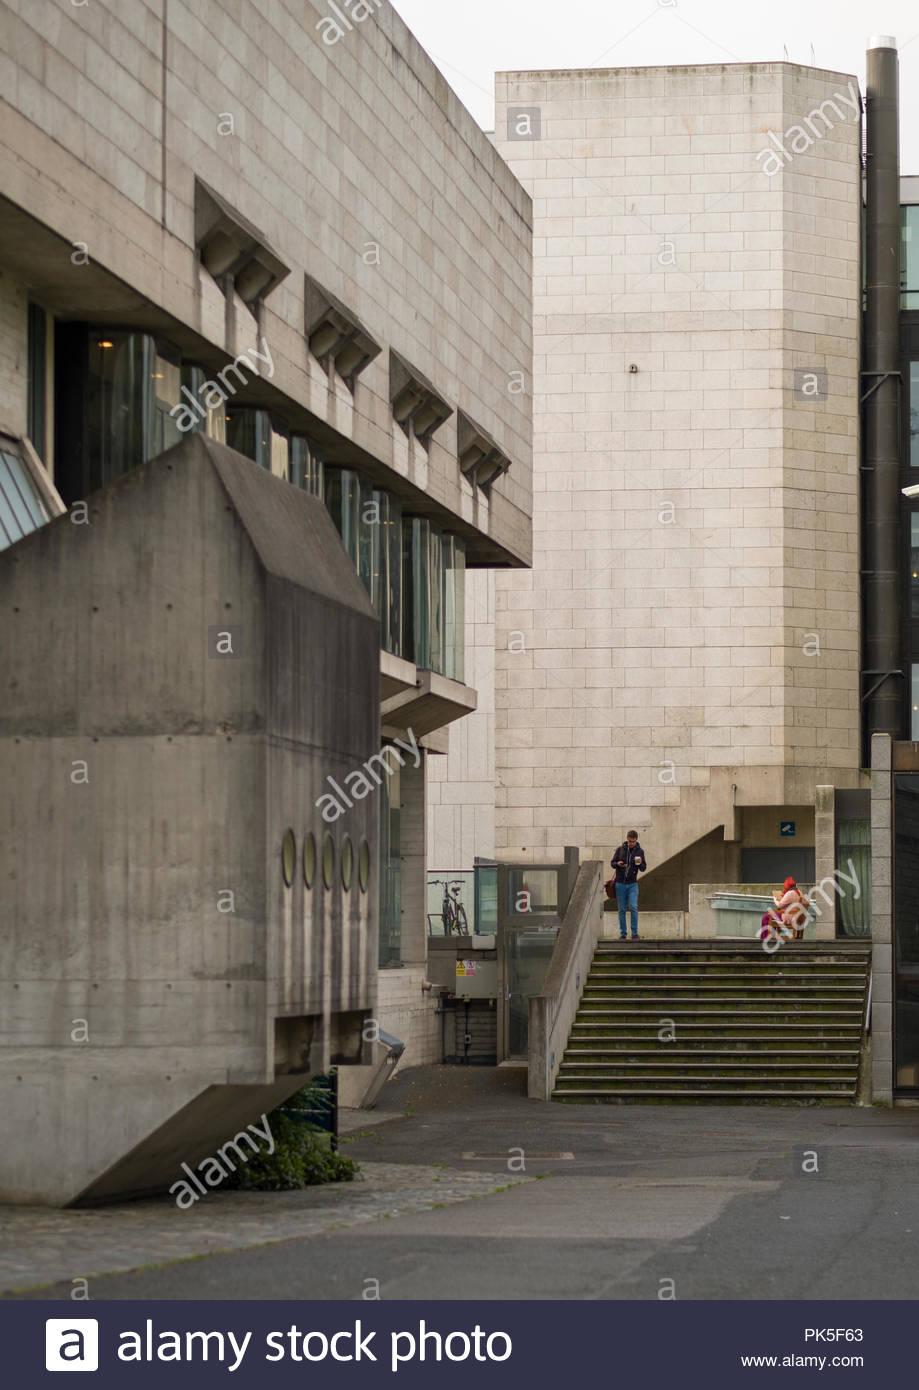 Berkeley Library Das Trinity College Dublin Leinster Irland